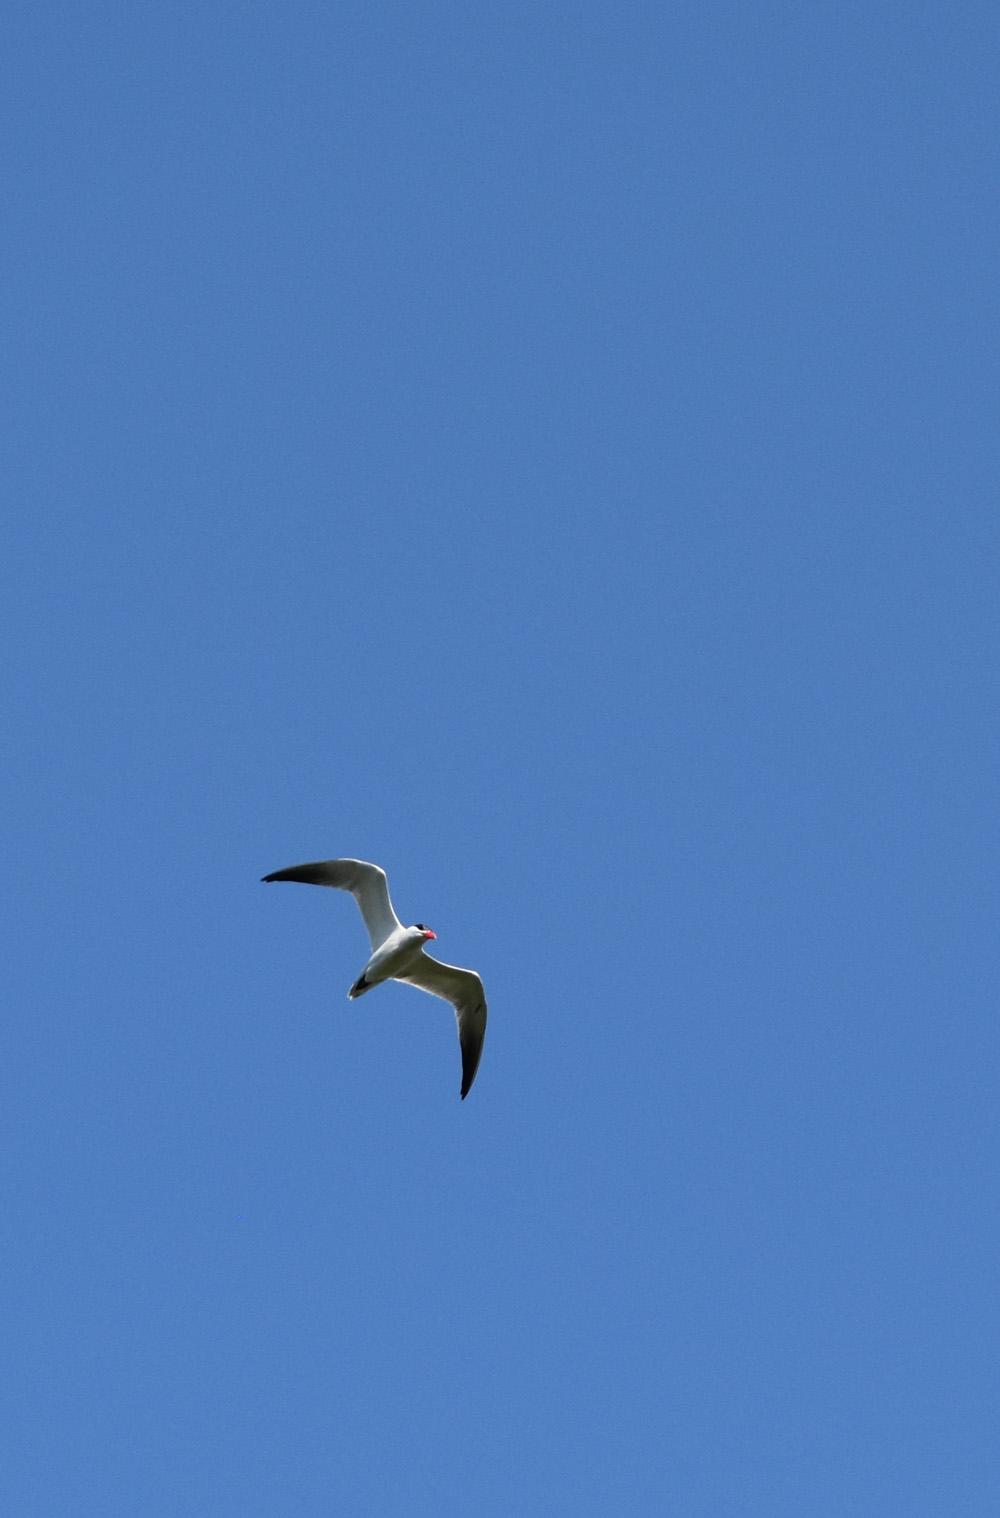 Photo of Tern Urquhart on NaturalCrooksDotCom